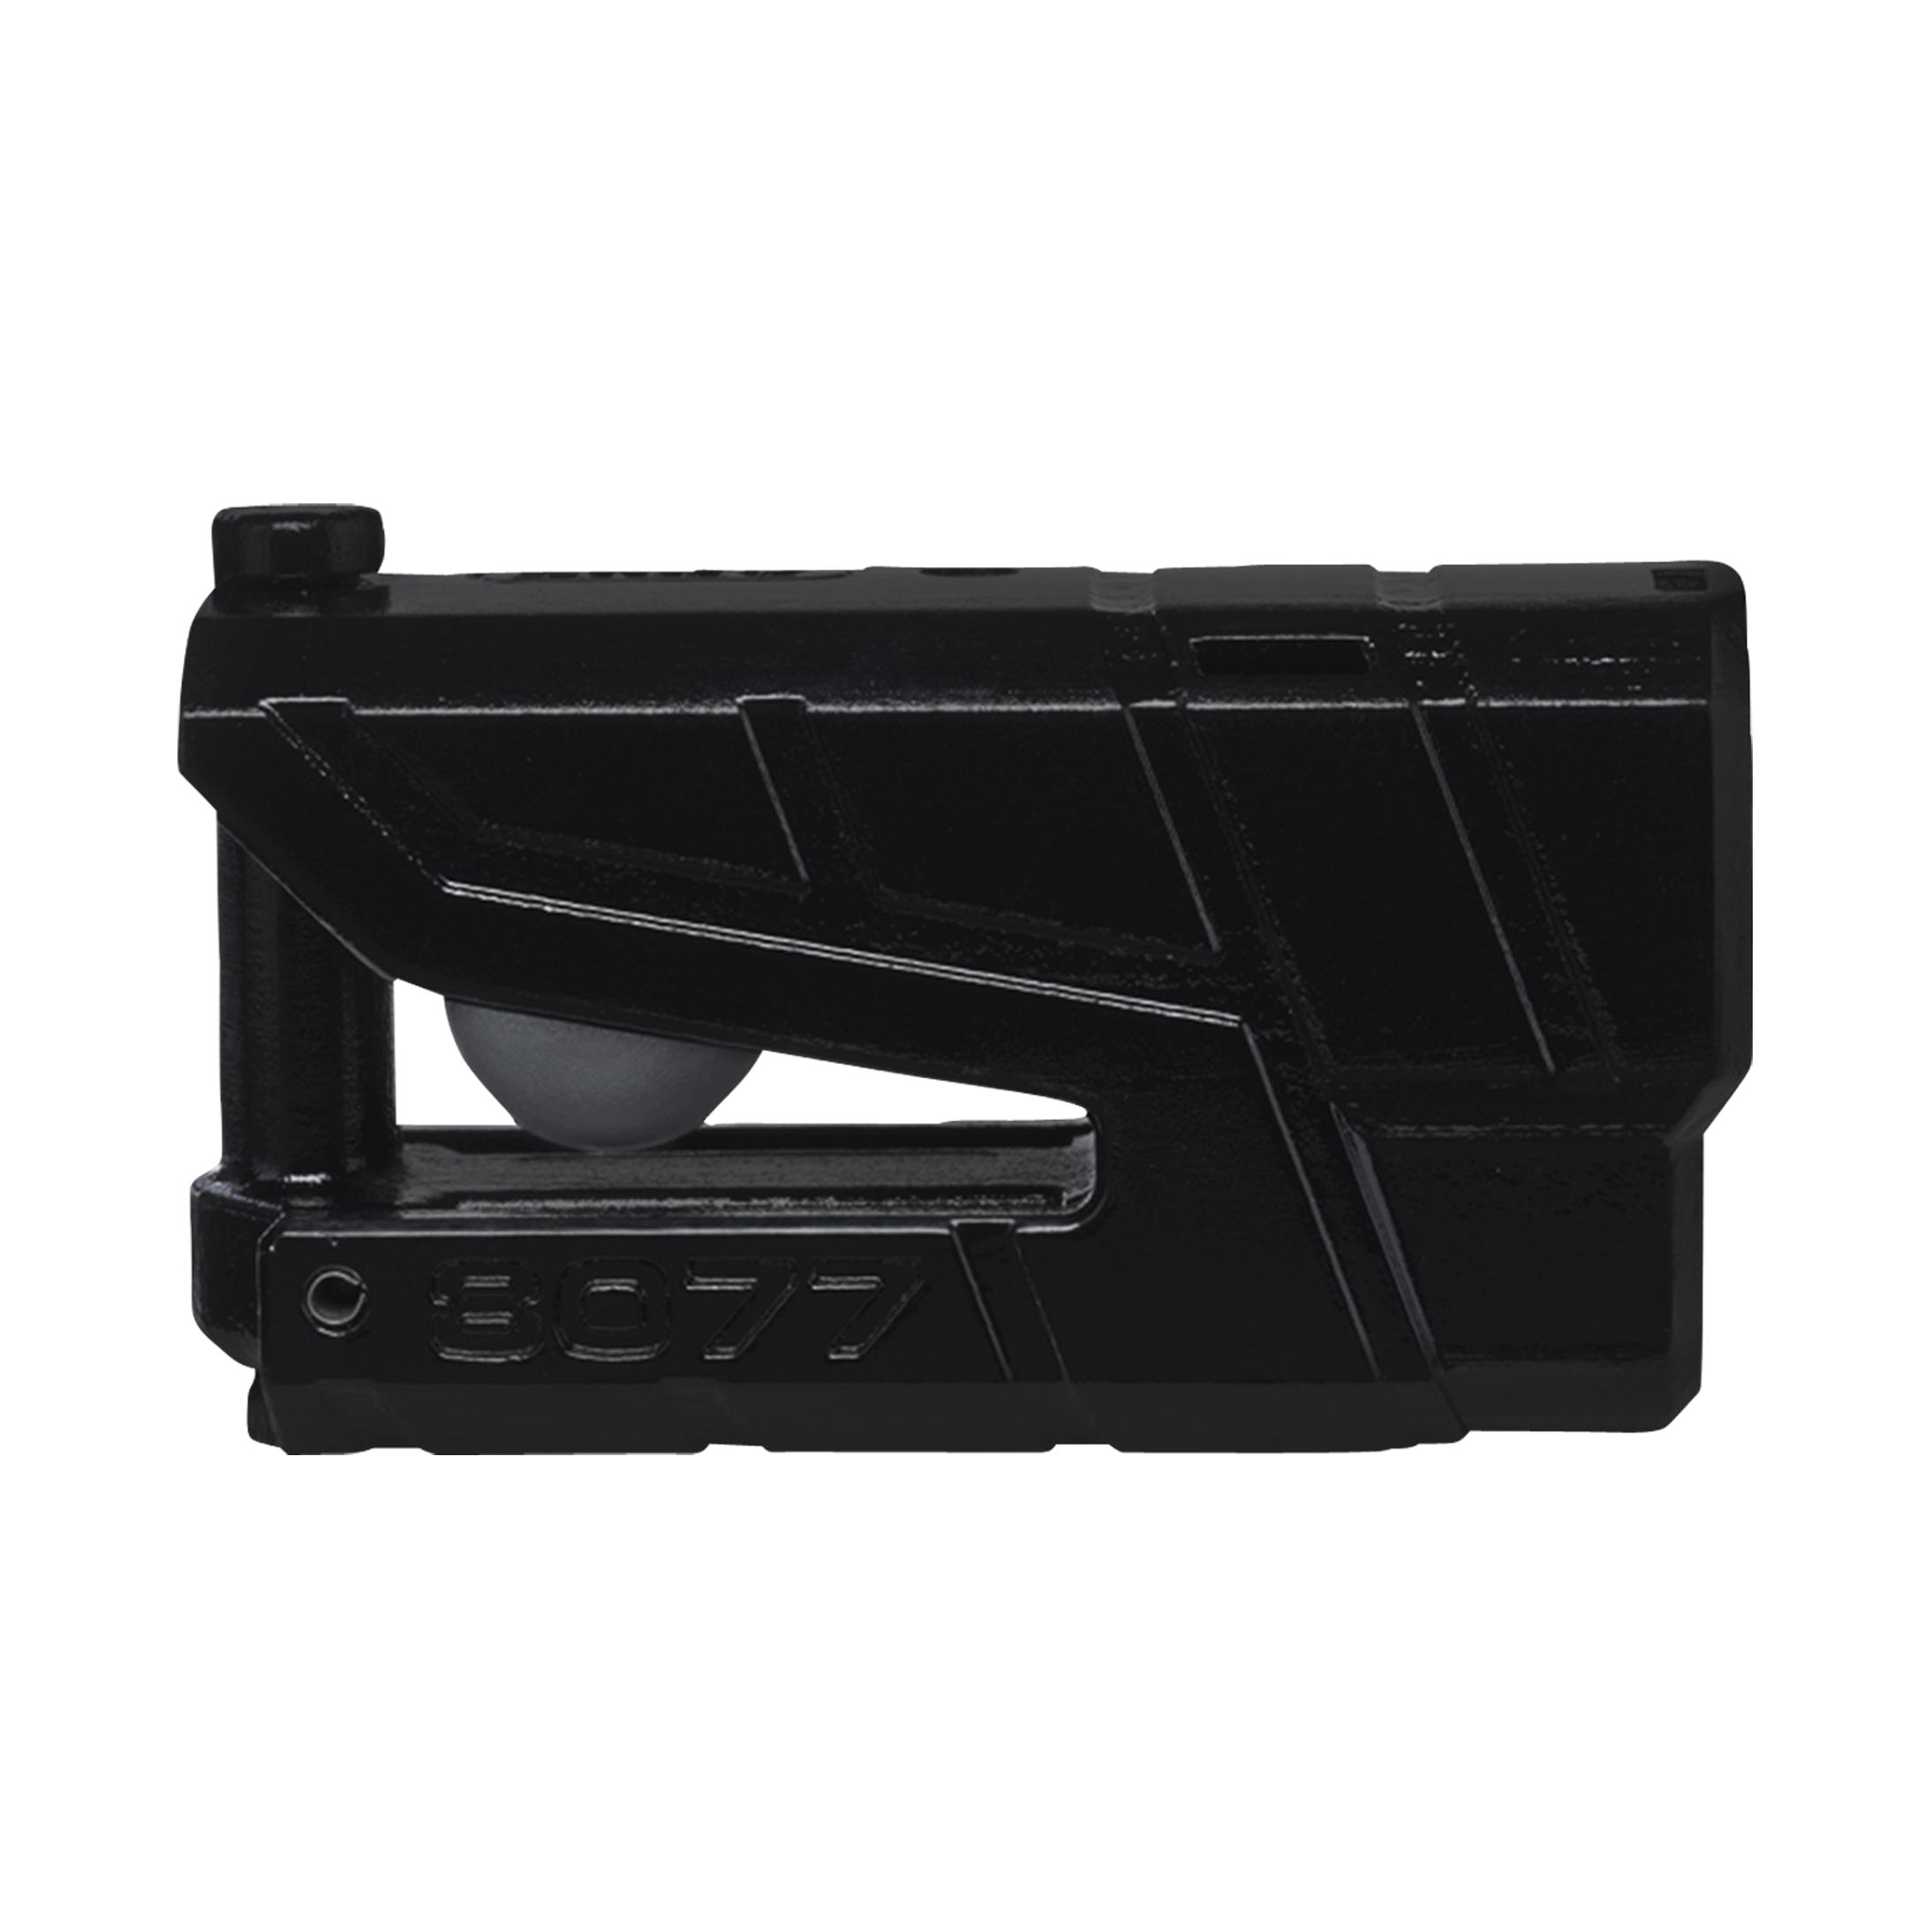 ABUS Bremsscheibenschloss-Alarm Abus Granit Detecto Xplus 8077